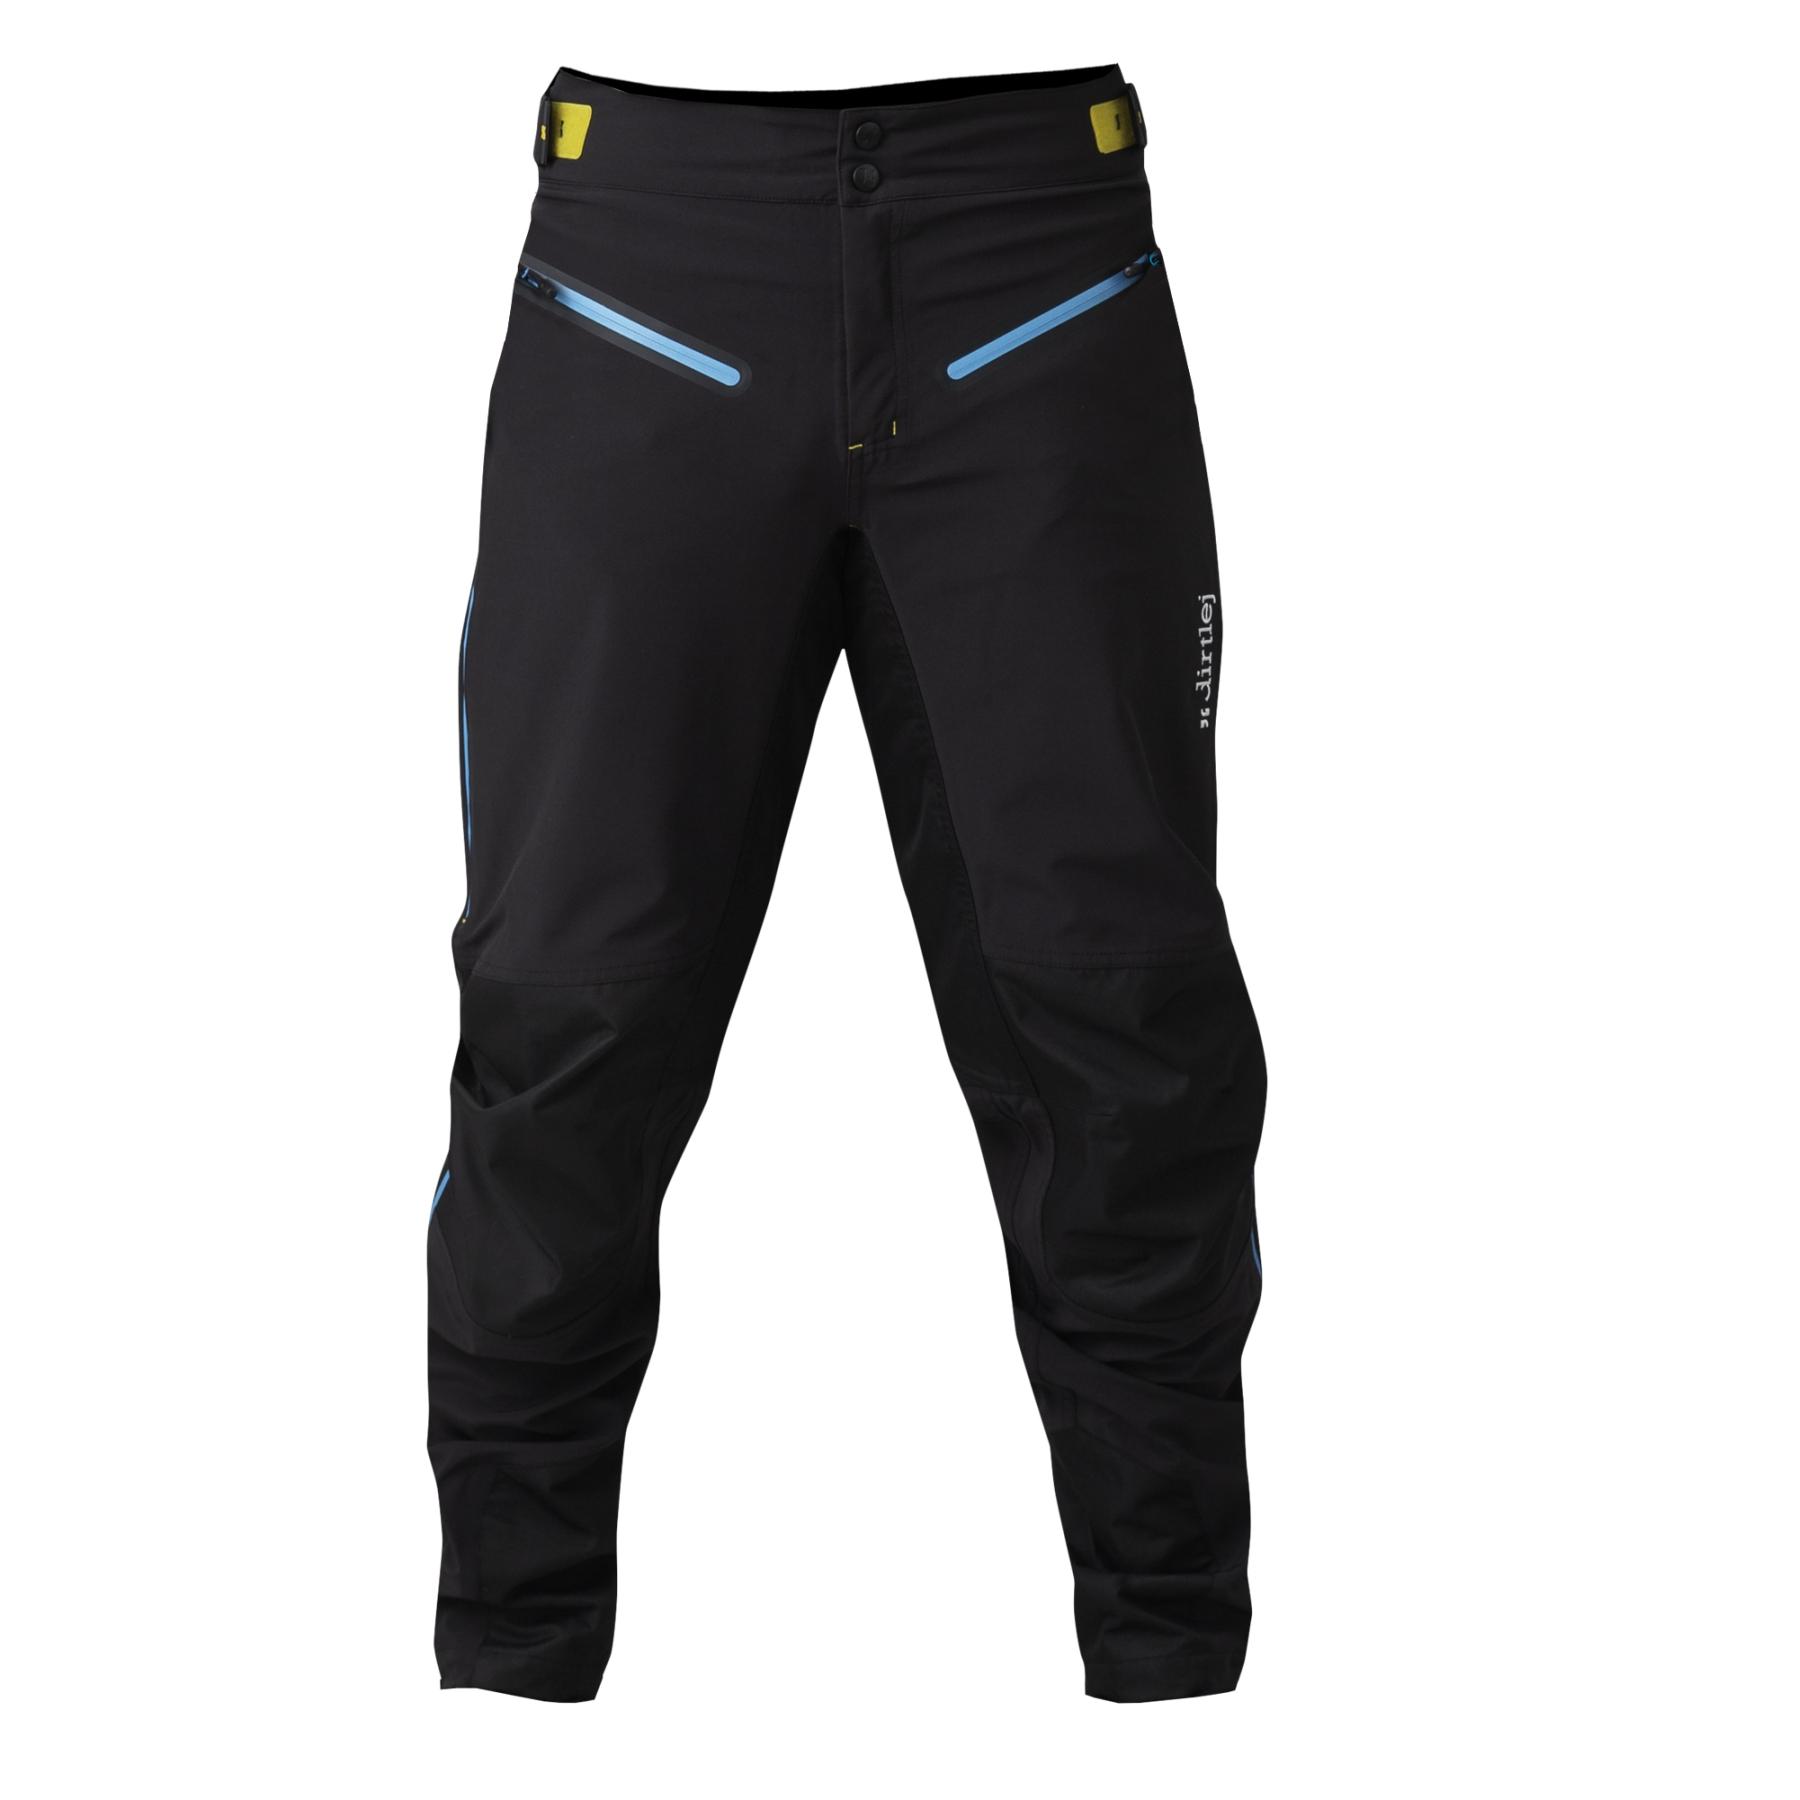 Foto de Dirtlej Trailscout Waterproof Pantalones para hombre - black/blue